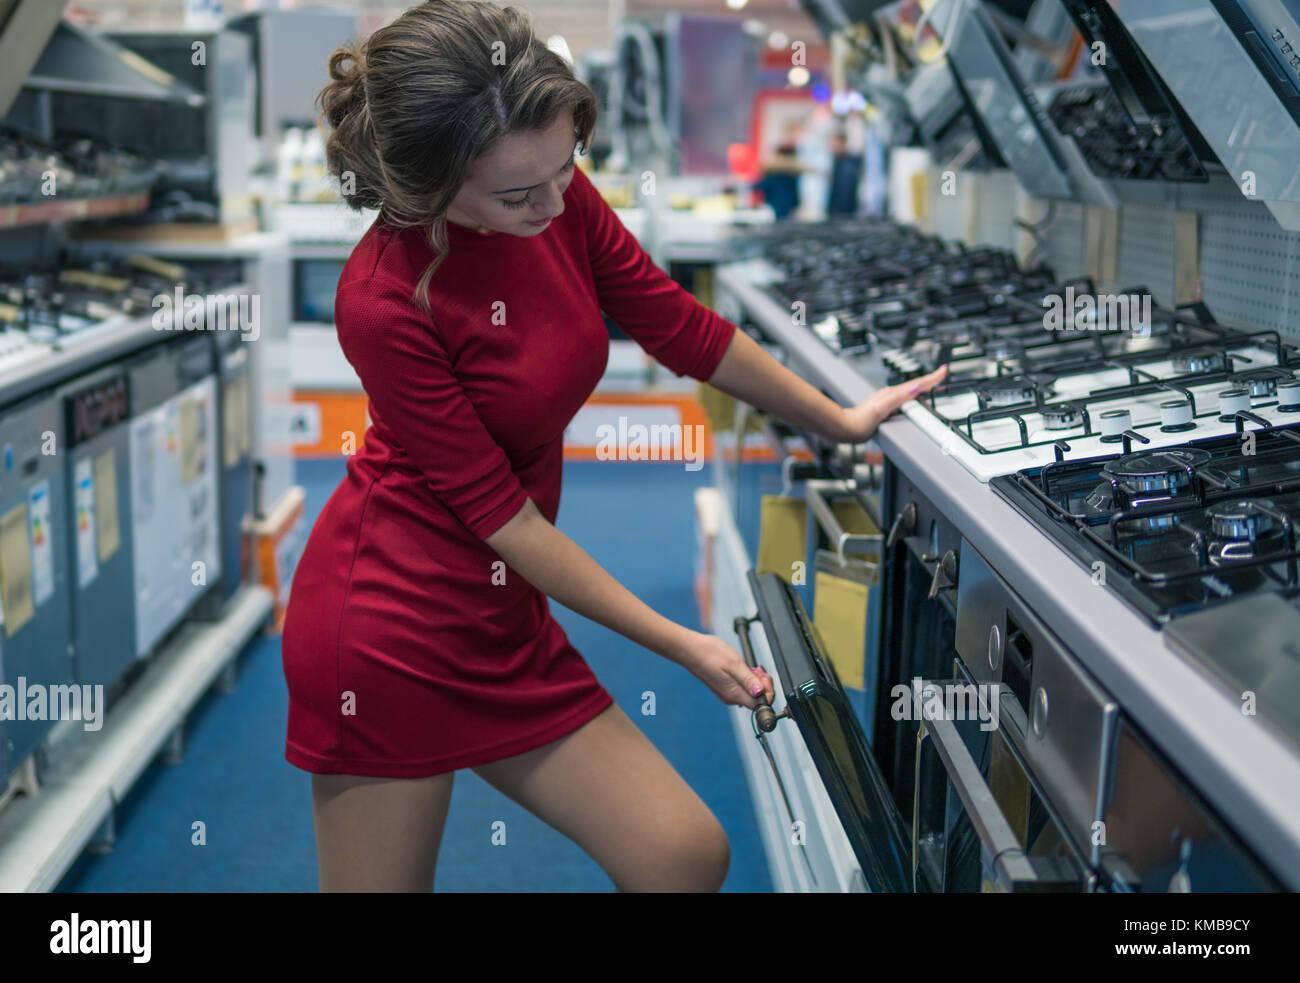 female housewife customer choosing large gas stove - Stock Image